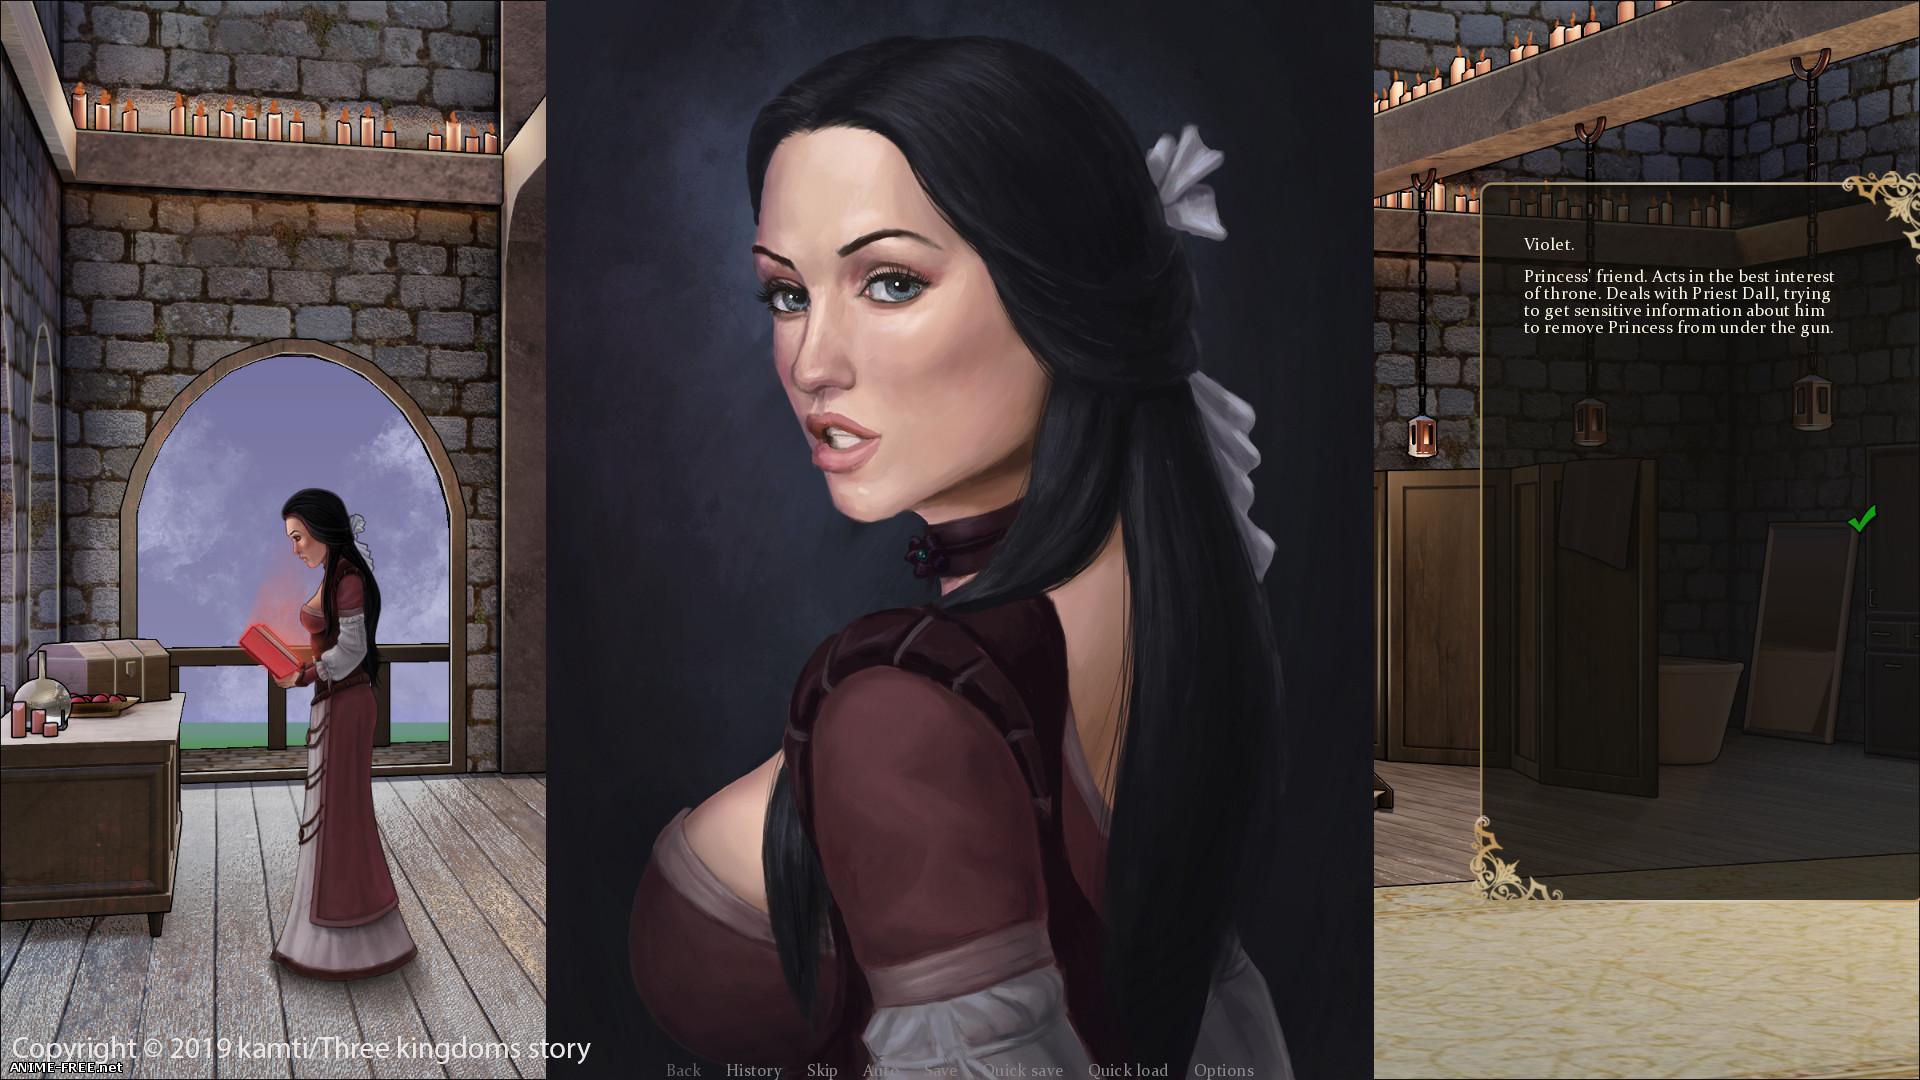 История трех королевств: Конуссия / Three kingdoms story: Conussia [2020] [Uncen] [VN] [Android Compatible] [RUS] H-Game